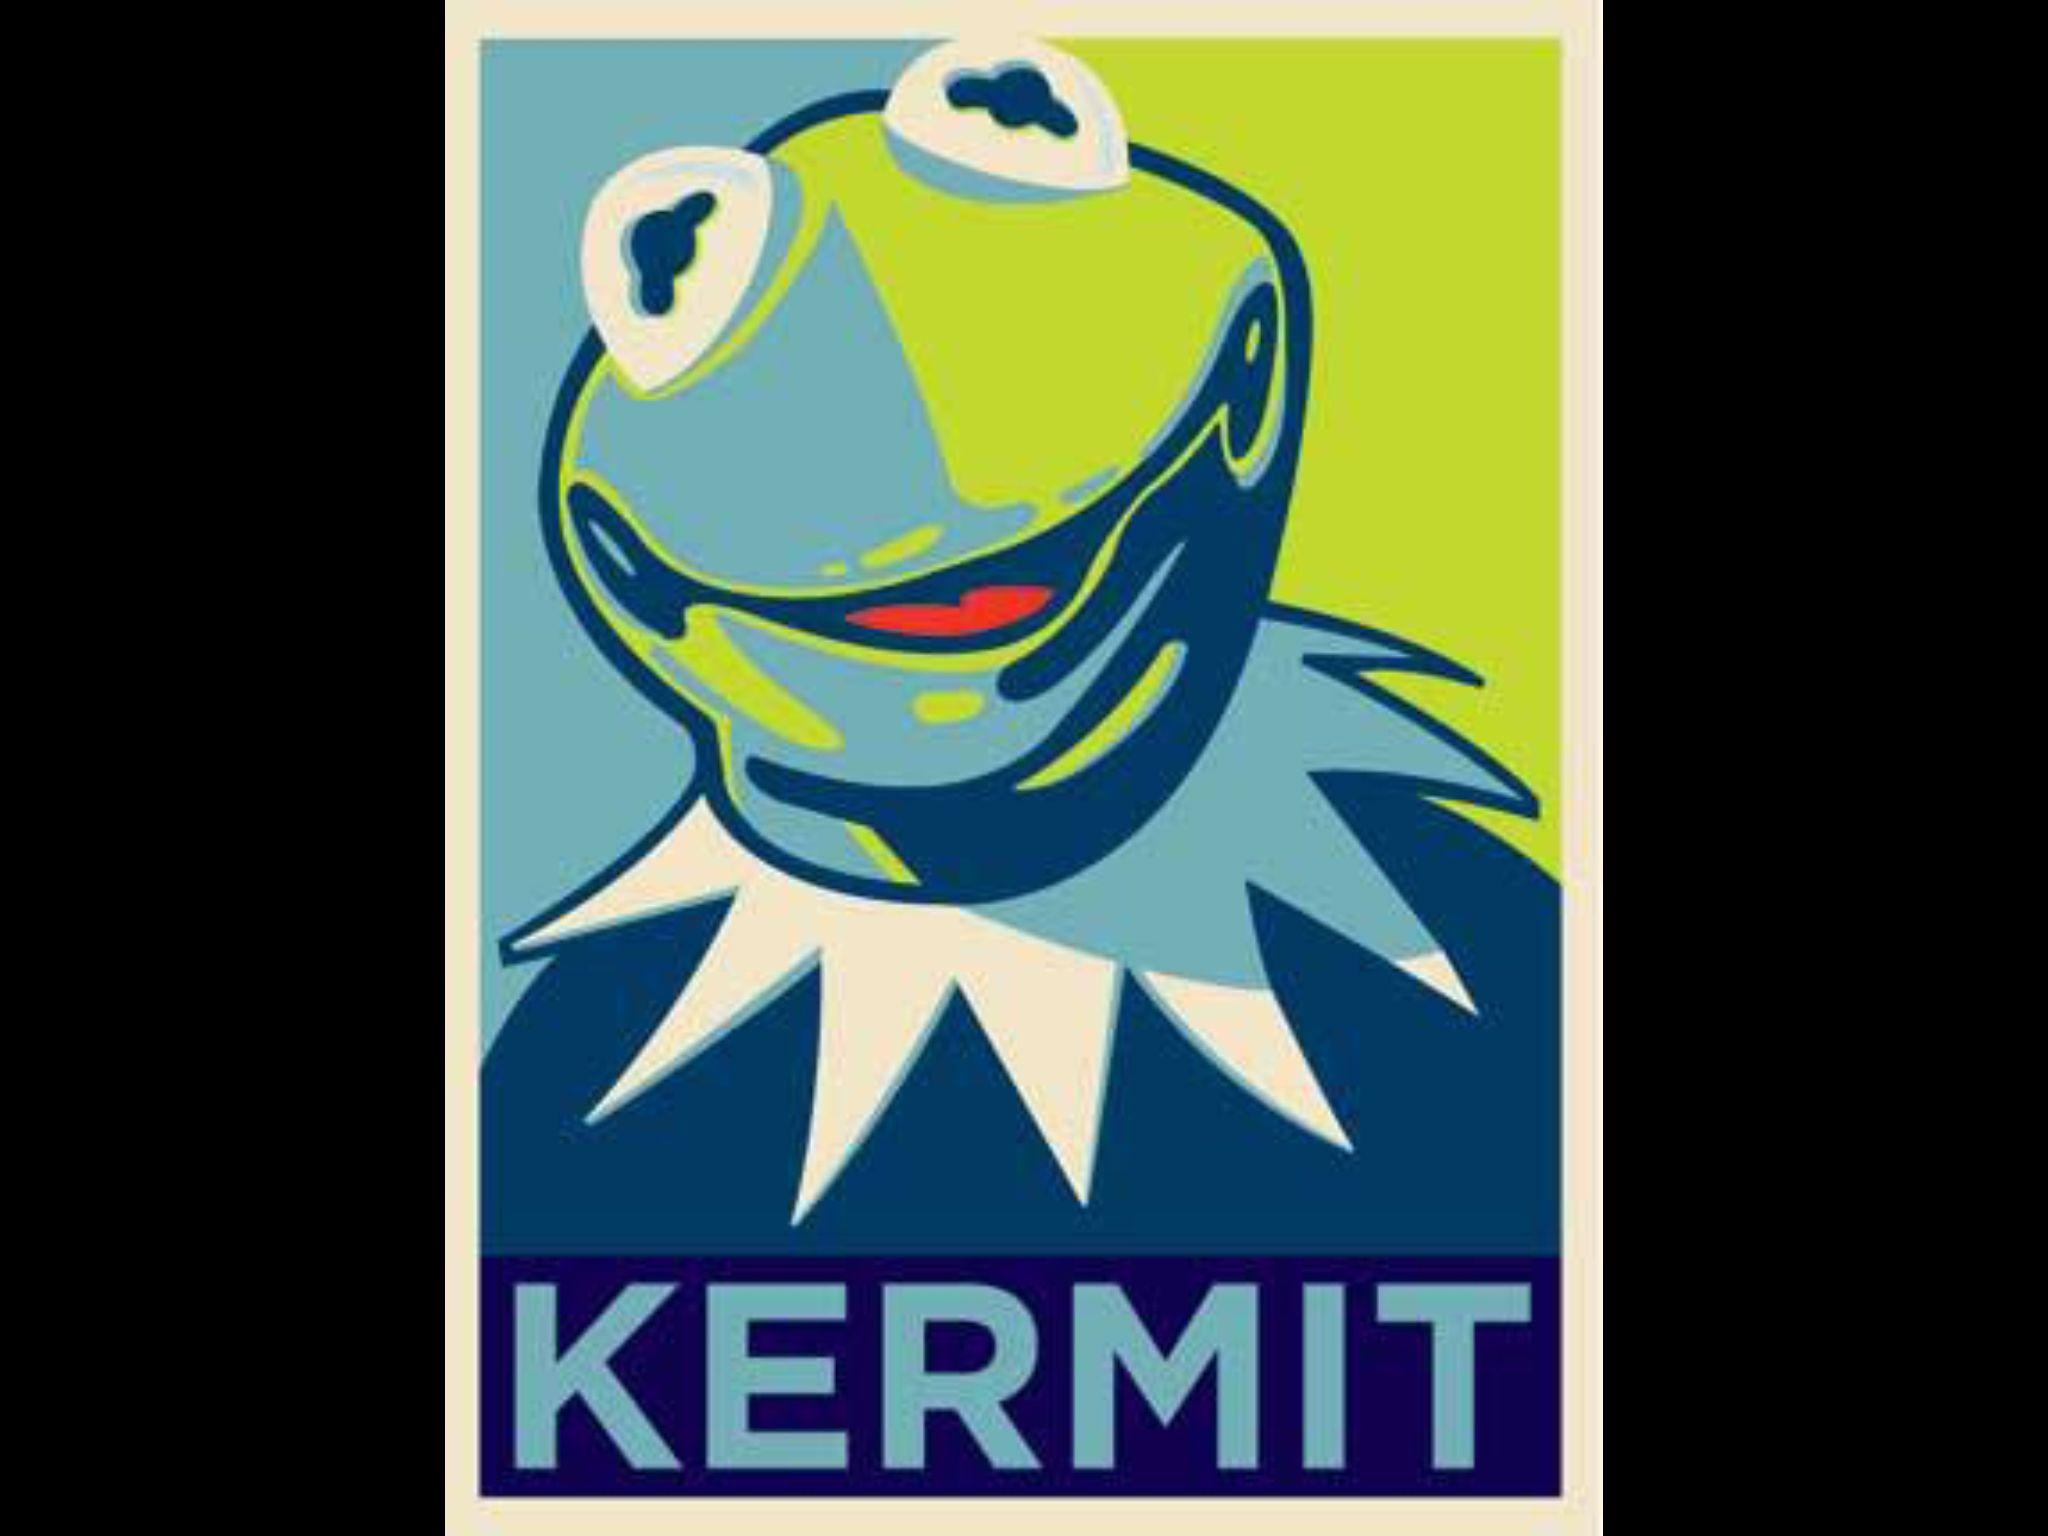 Pin de Marcia Neisler en Kermit the Frog   Pinterest